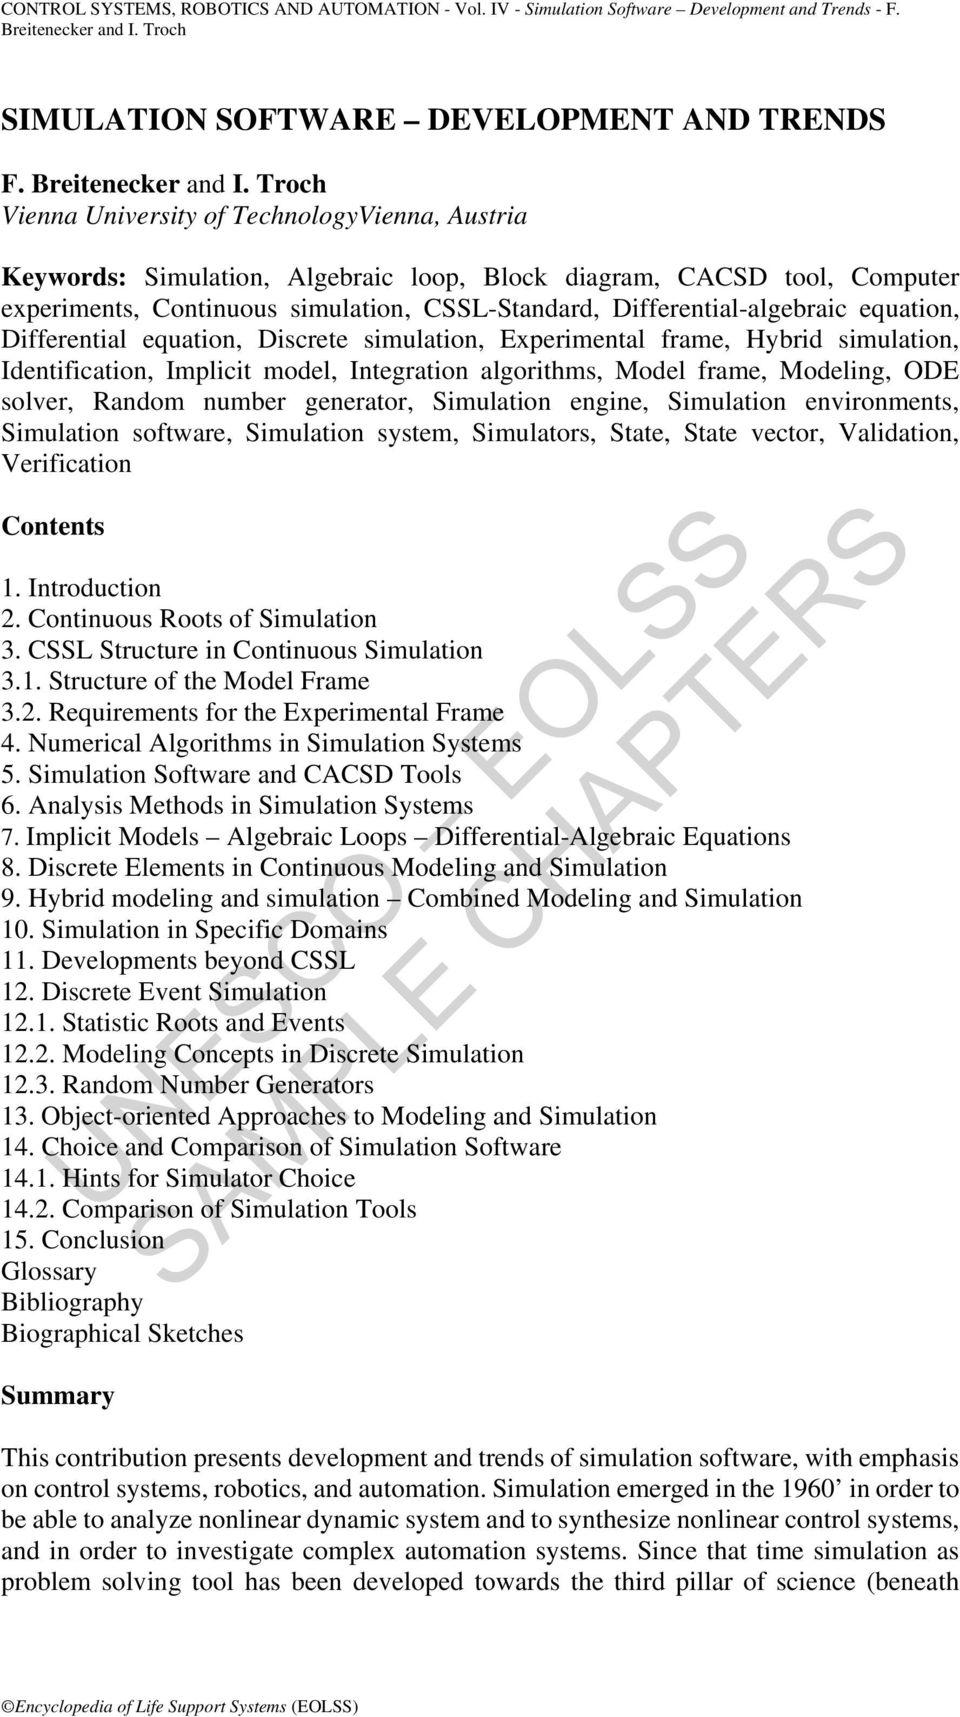 hight resolution of equation differential equation discrete simulation experimental frame hybrid simulation identification